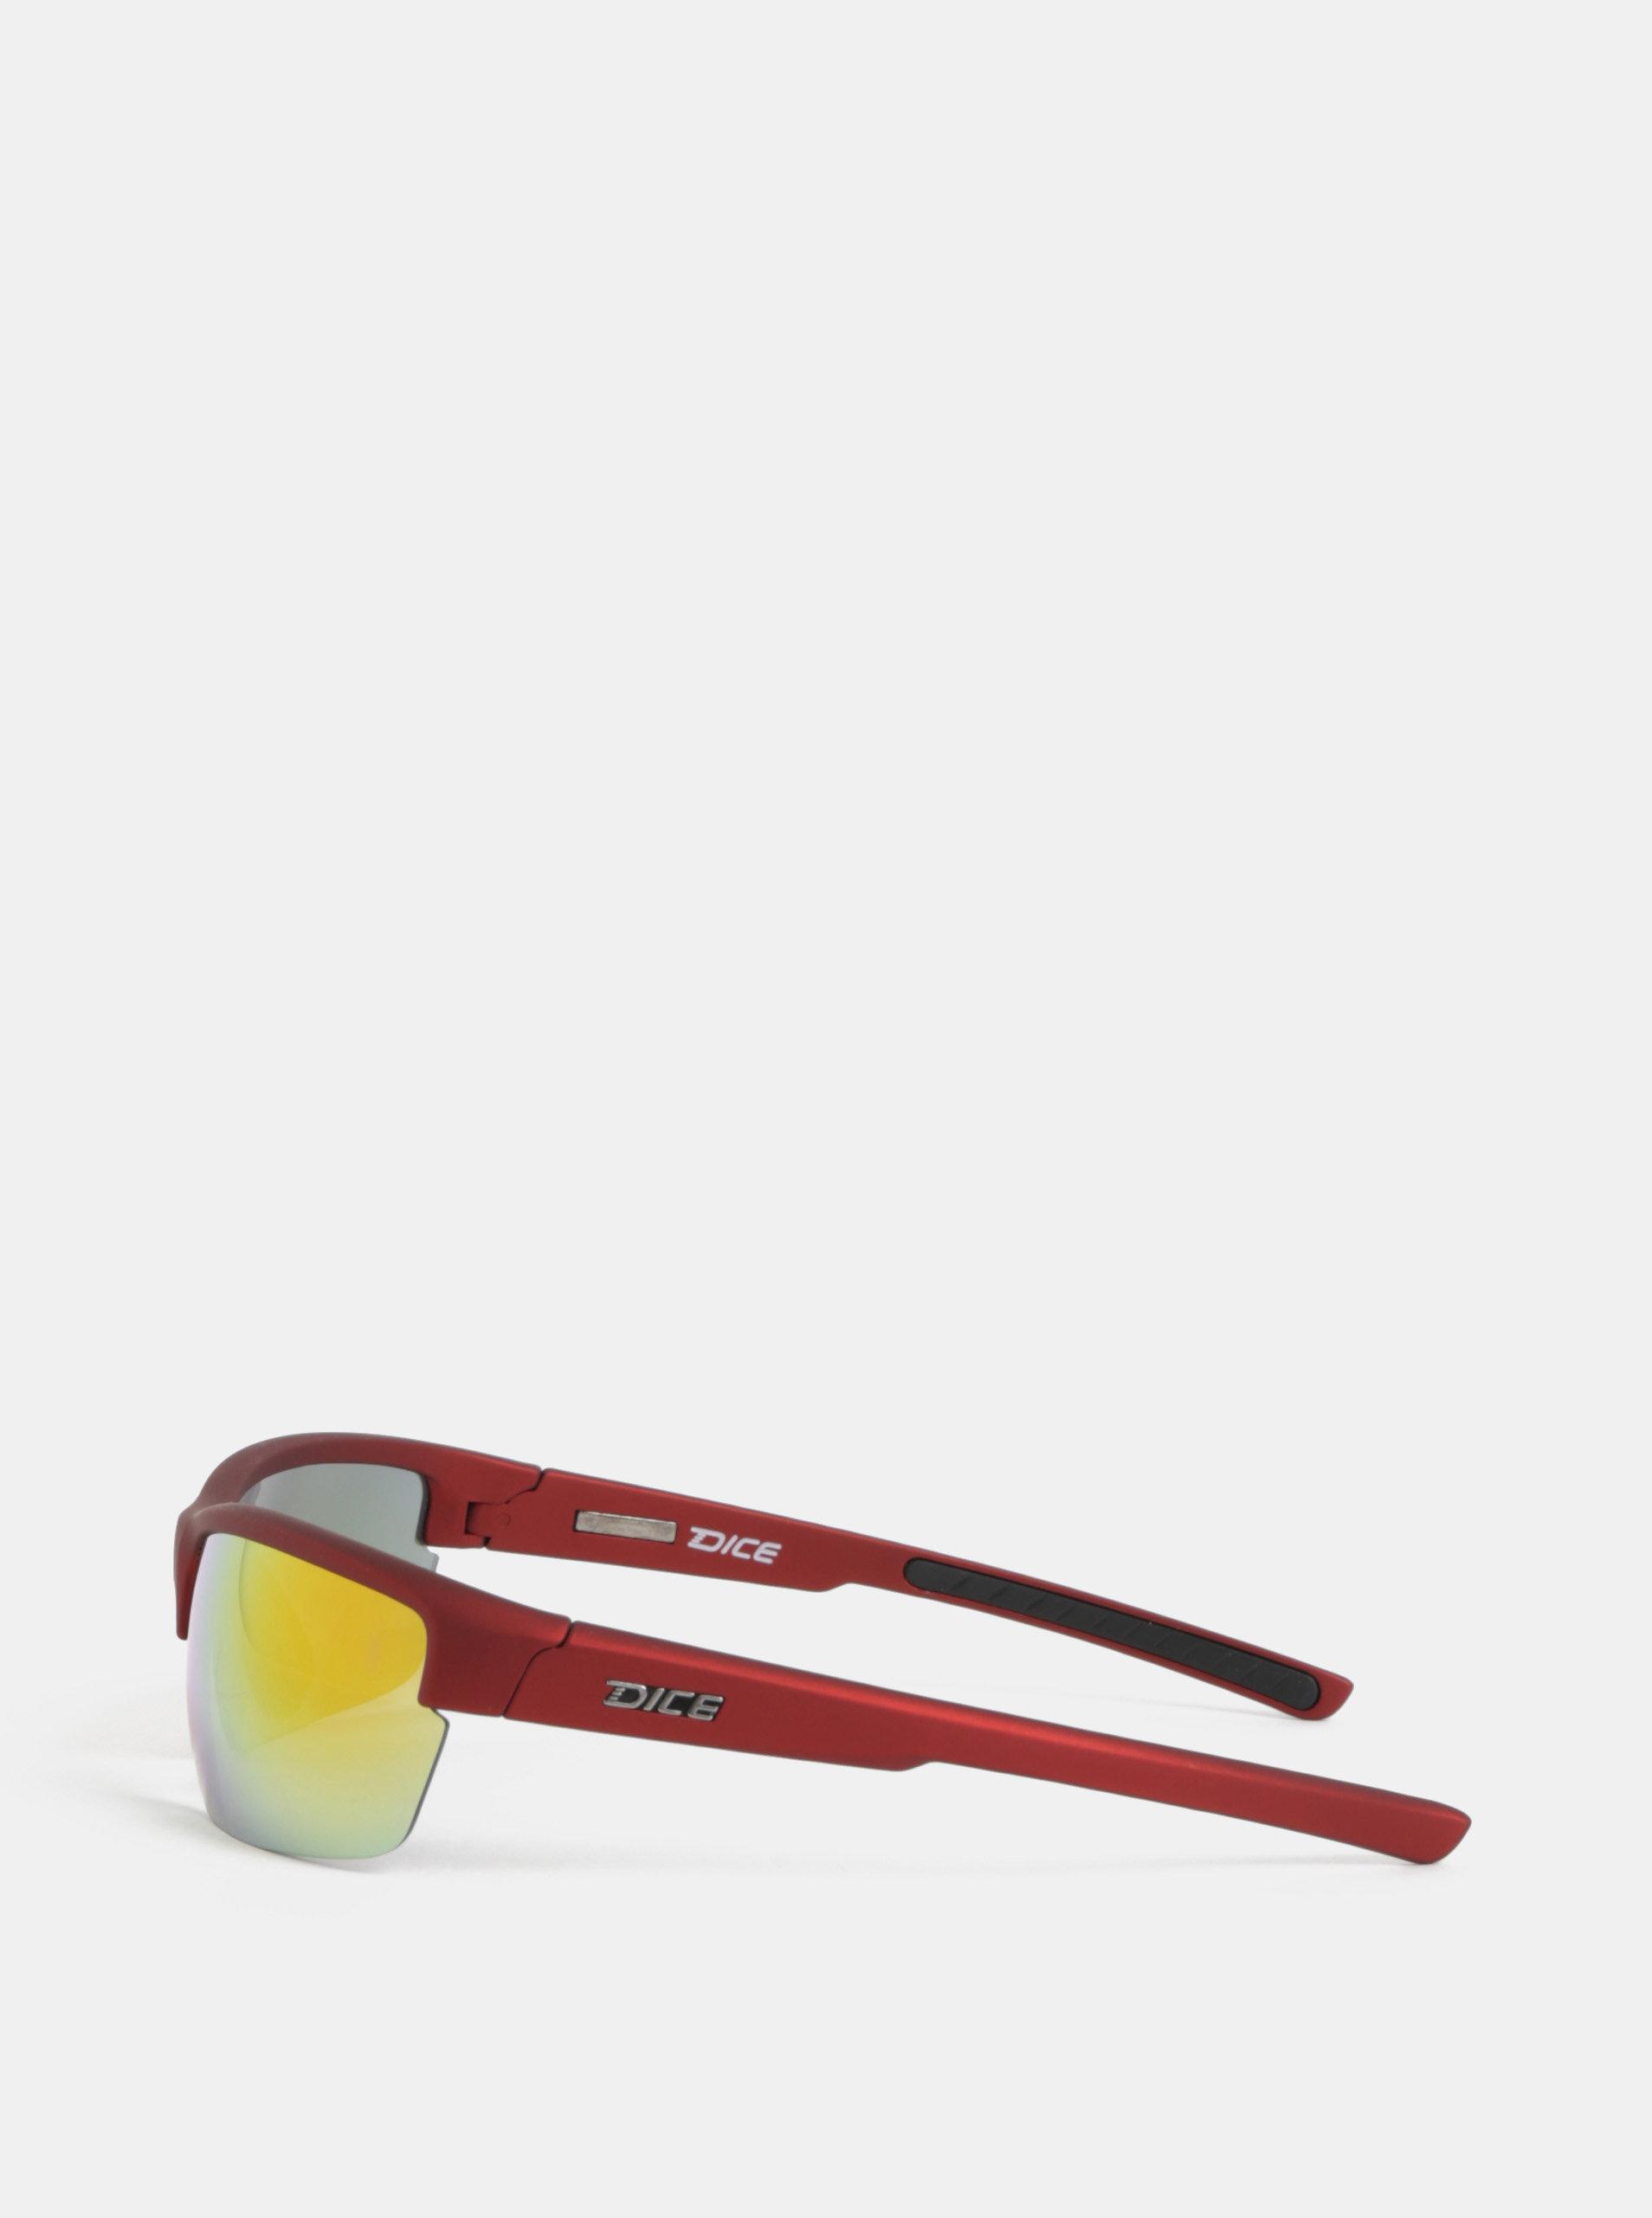 1cd5fadd8 Červené pánske slnečné okuliare Dice Sport | ZOOT.sk